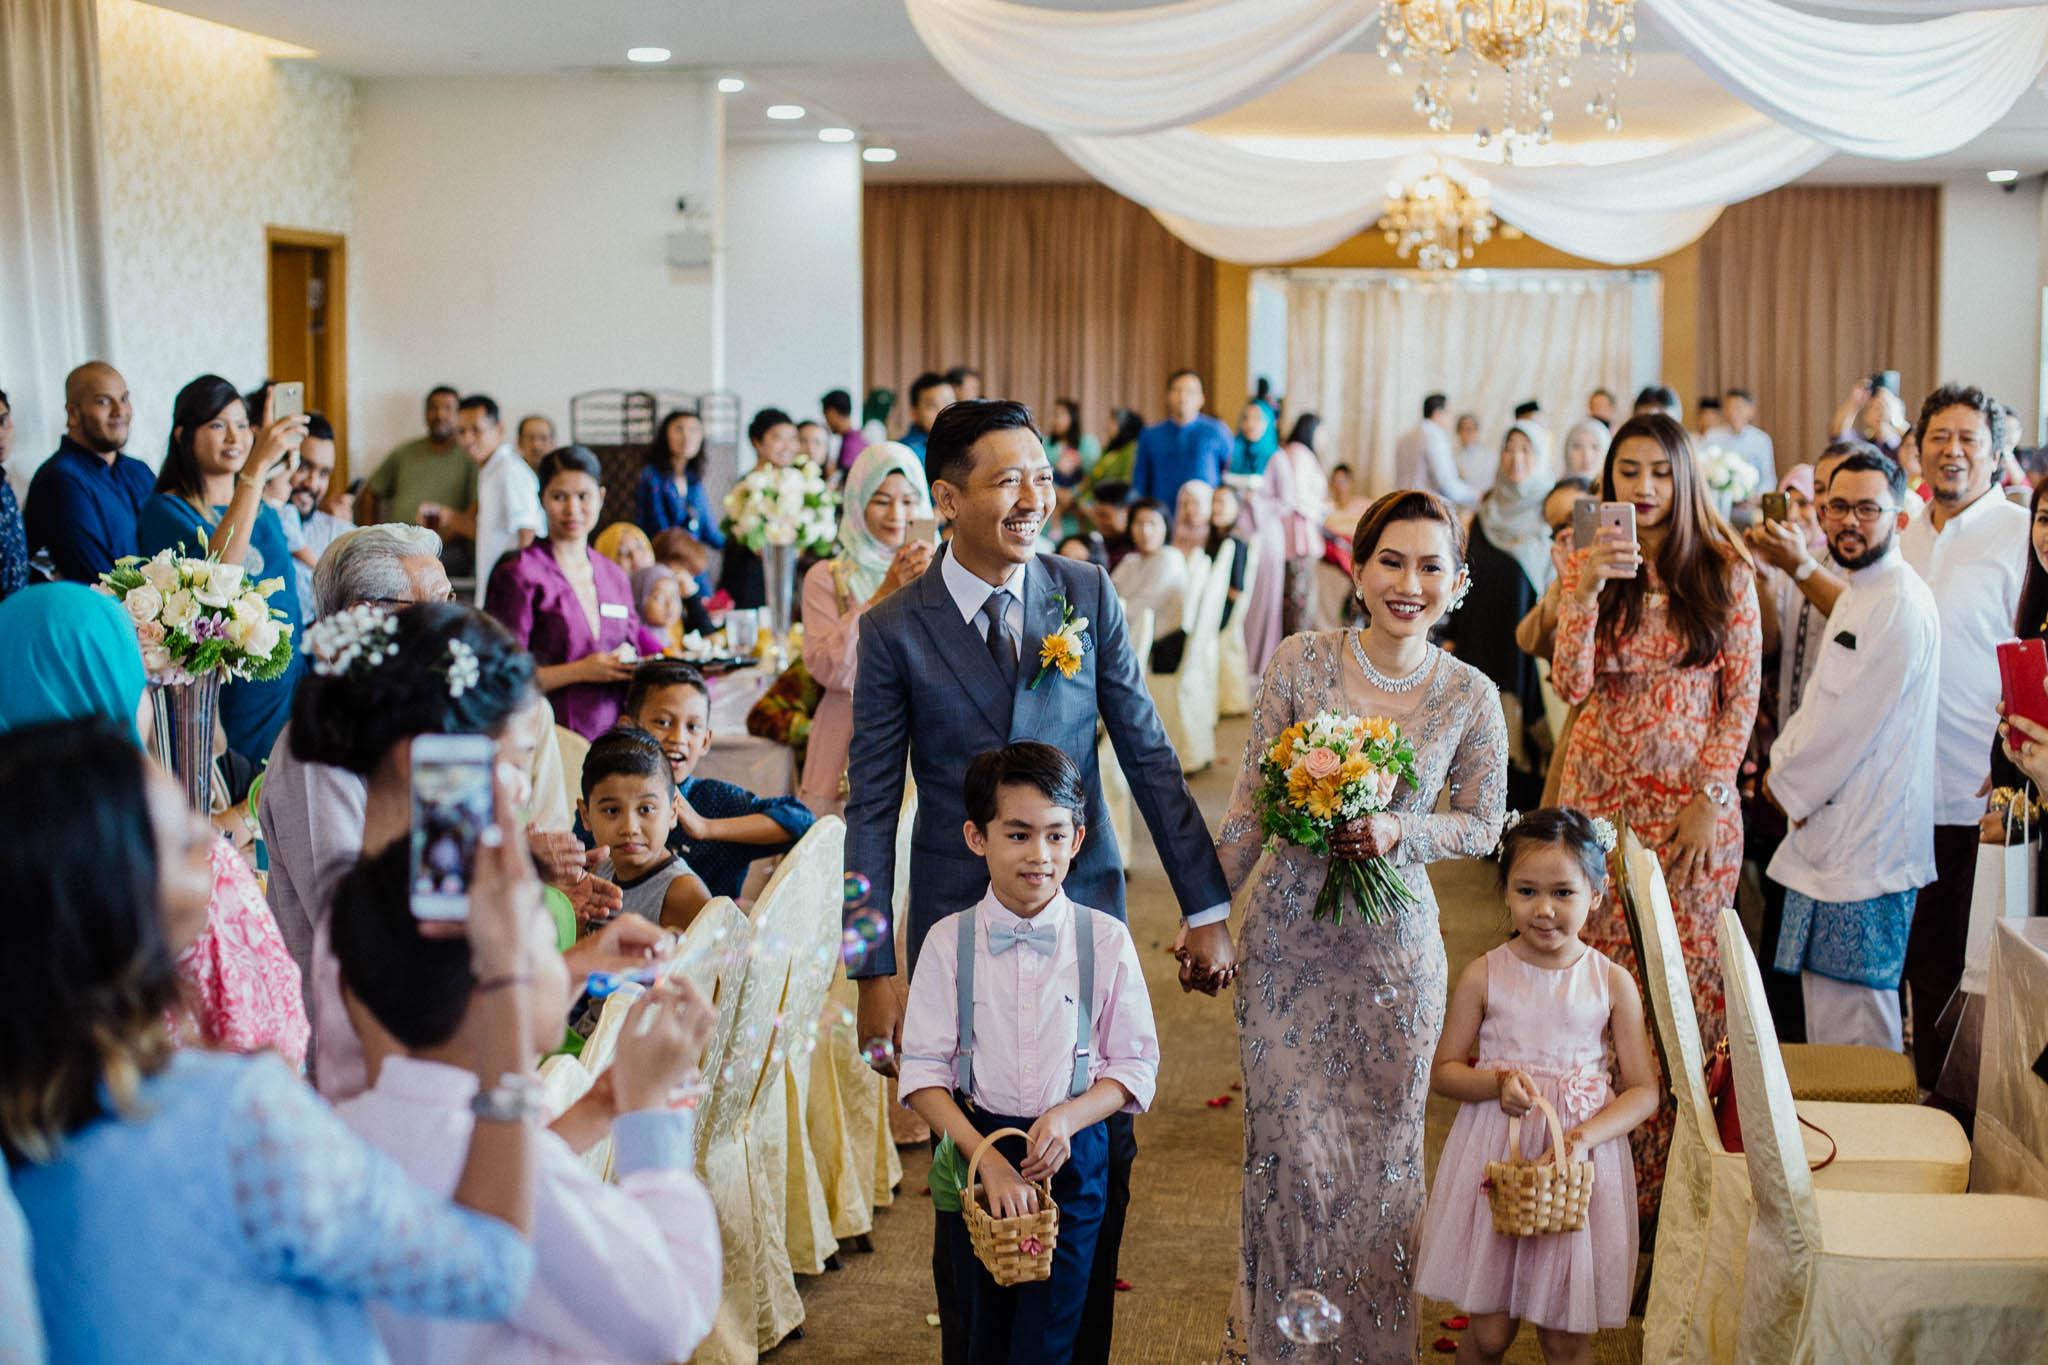 singapore-wedding-photographer-addafiq-nufail-050.jpg